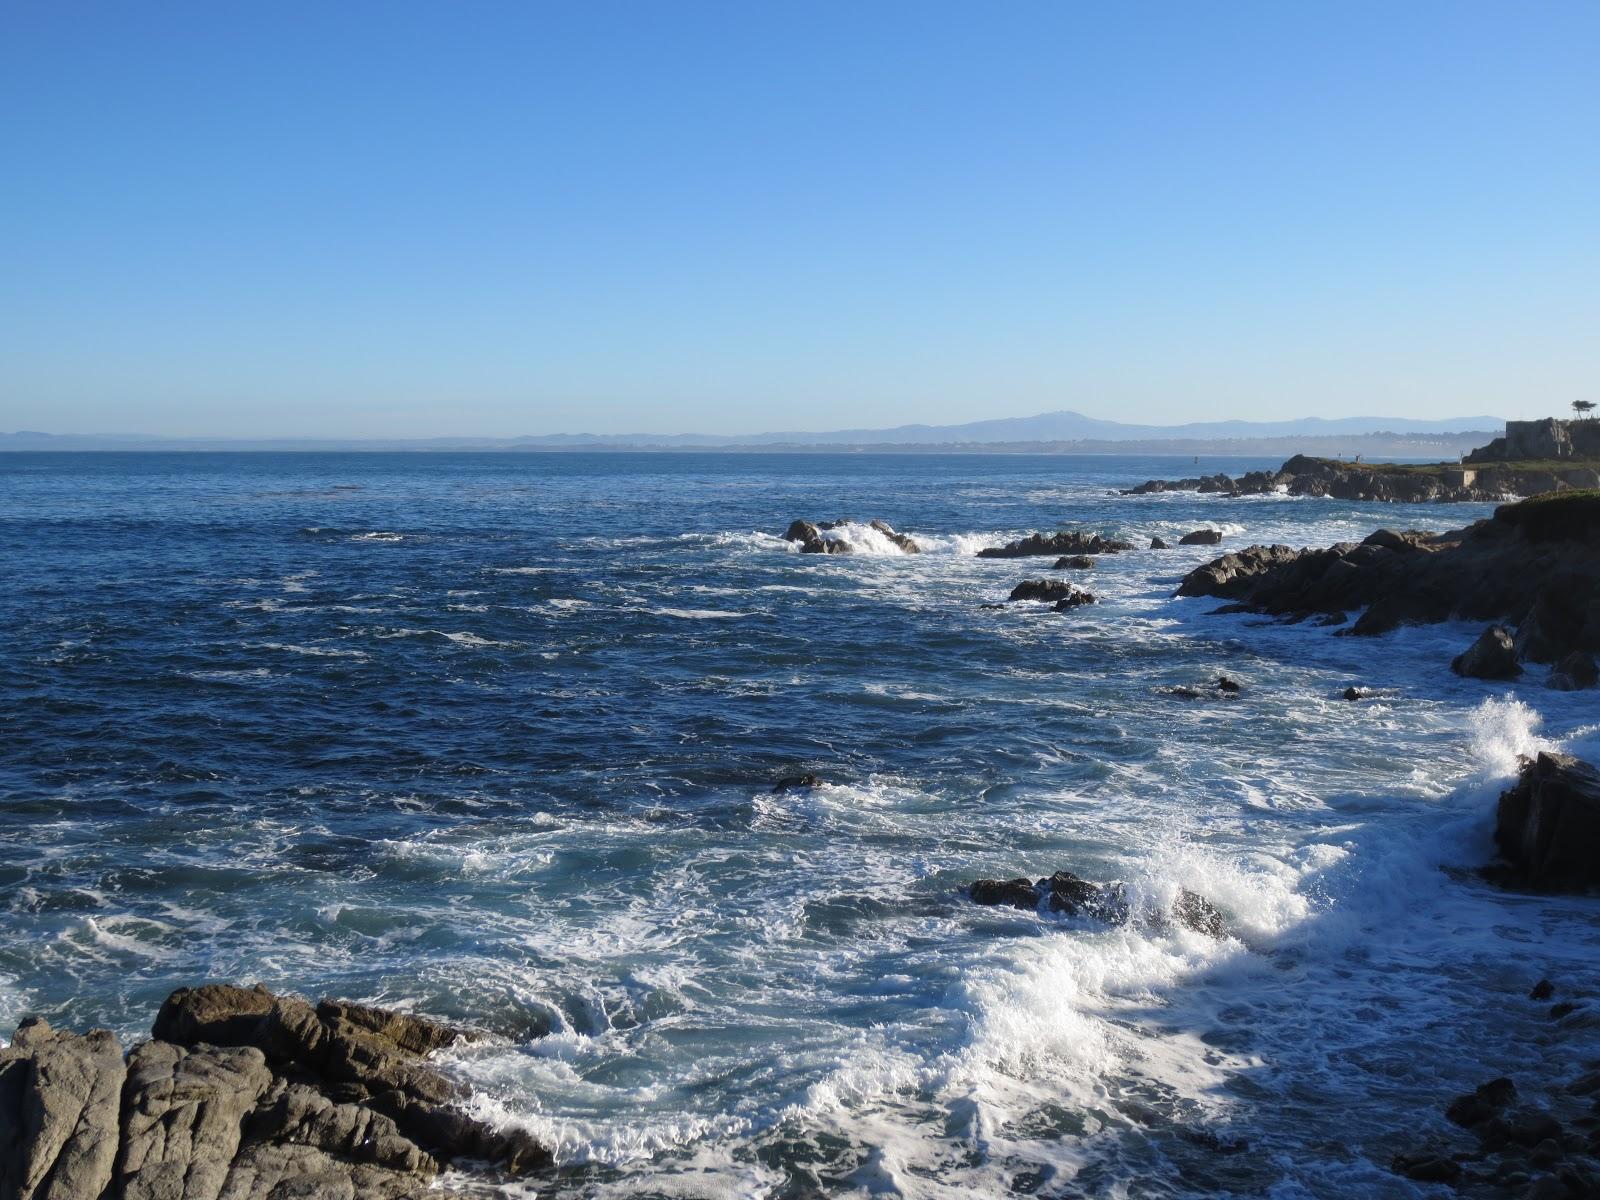 California, Fall, McWay, Pacific Ocean Wallpapers HD ...  |Pacific Ocean California